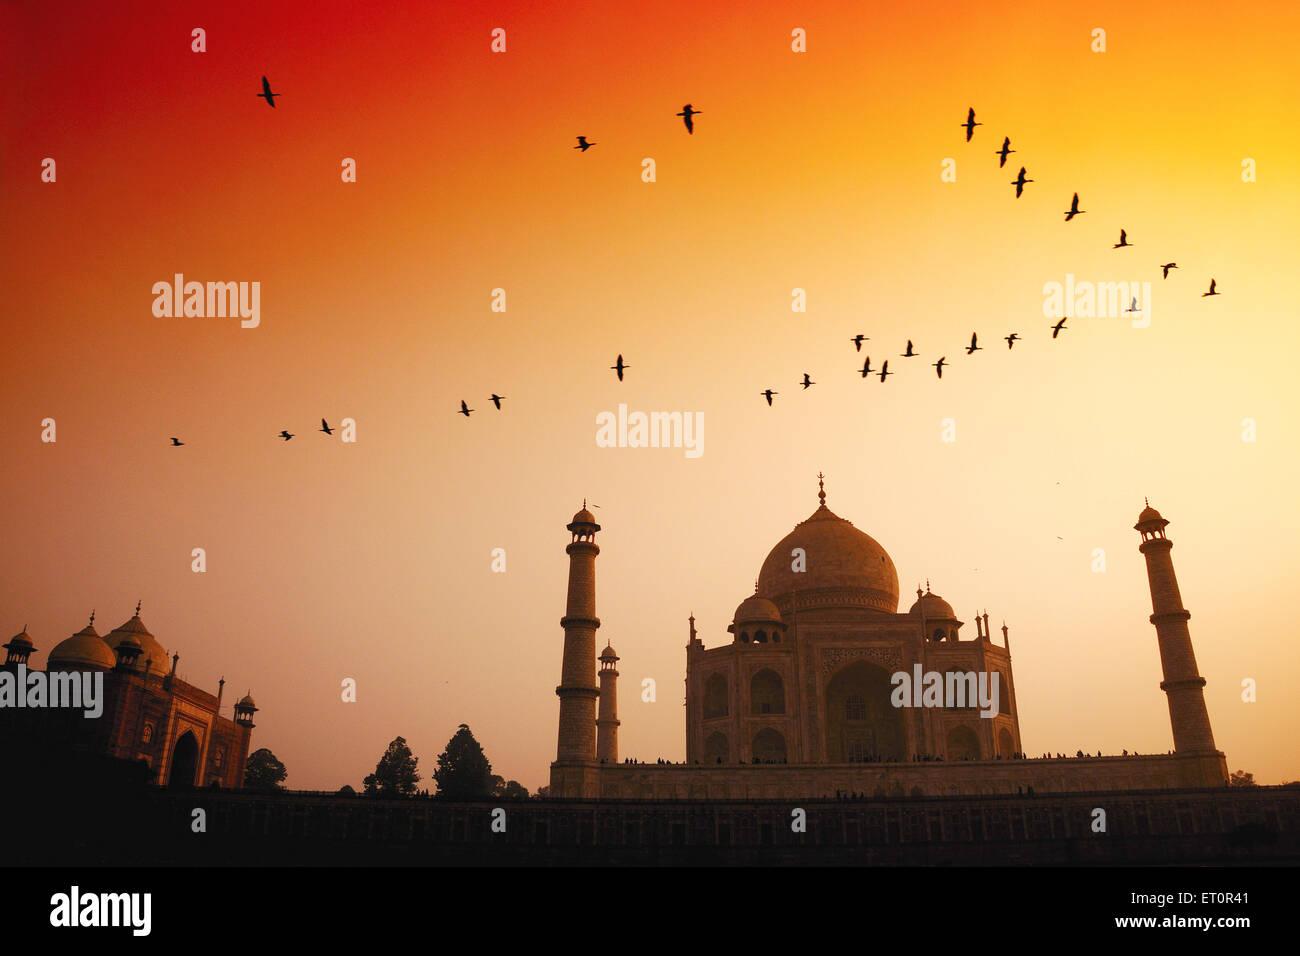 Birds flying in sky over Taj Mahal at sunset ; Agra ; Uttar Pradesh ; India Stock Photo